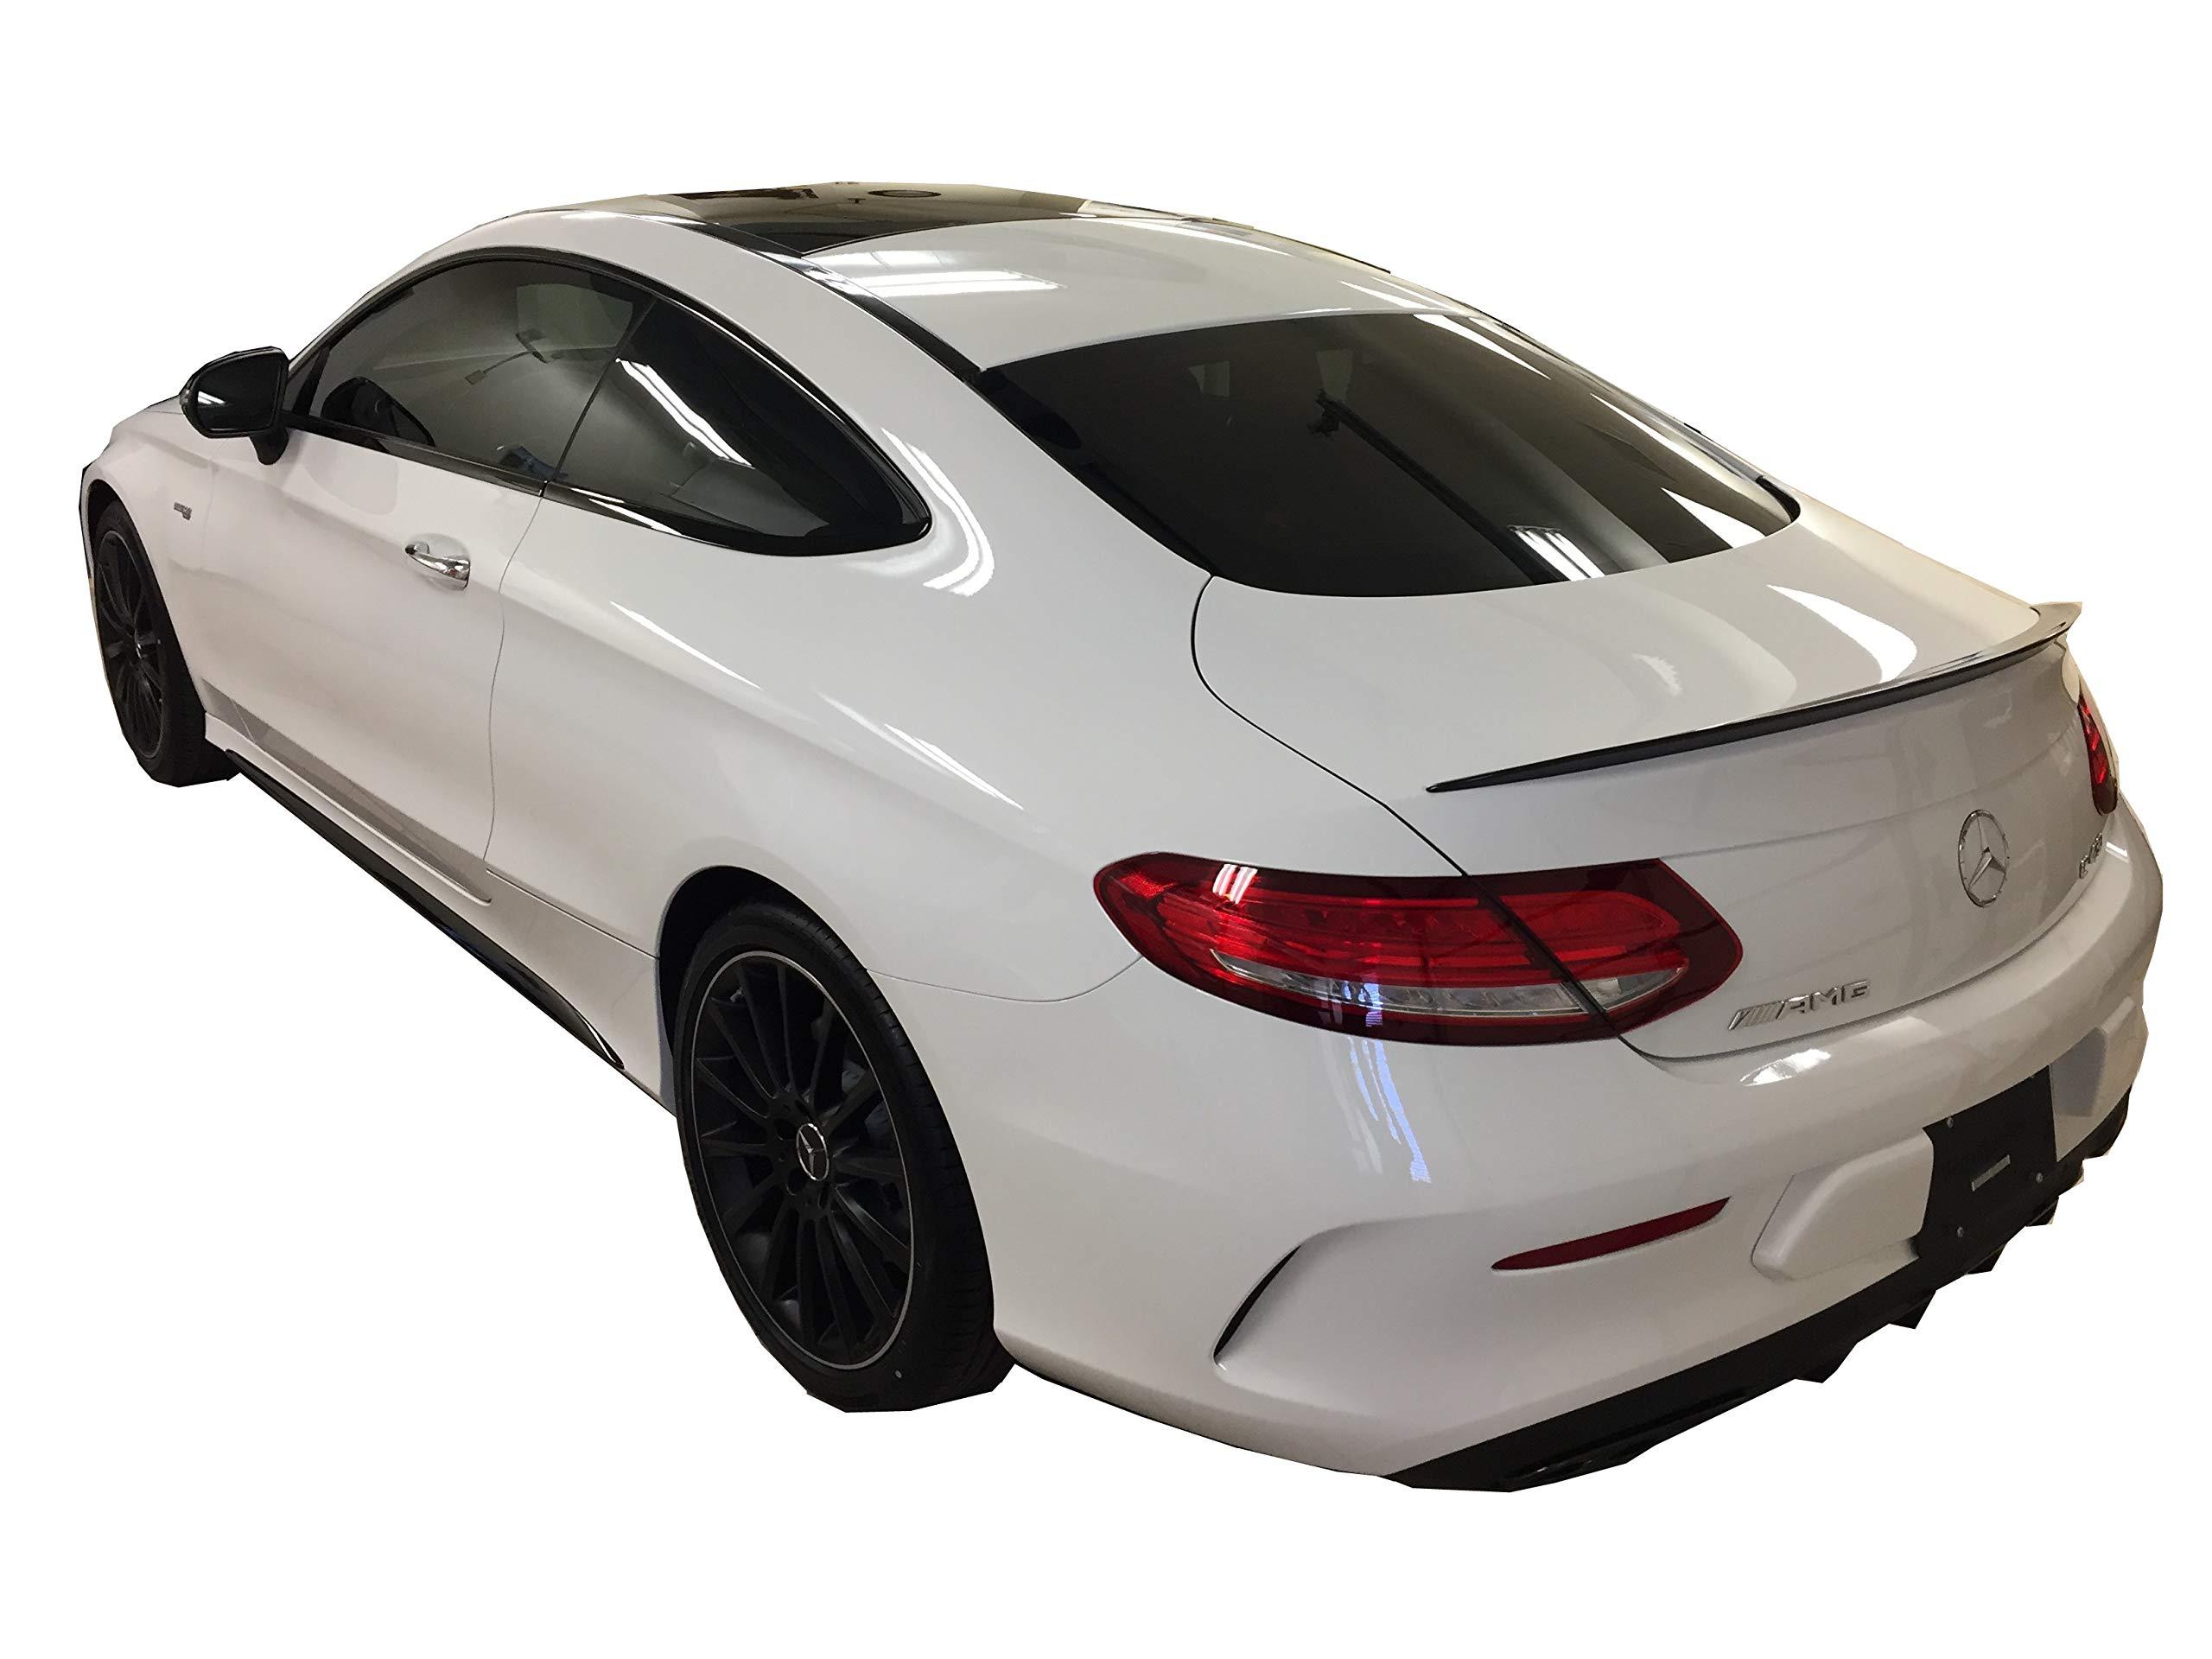 LEXEN 2Ply Premium Carbon 20'' X 100FT Roll Window Tint Film Auto Car (5% Limo (Darkest Shade)) by LEXEN (Image #7)